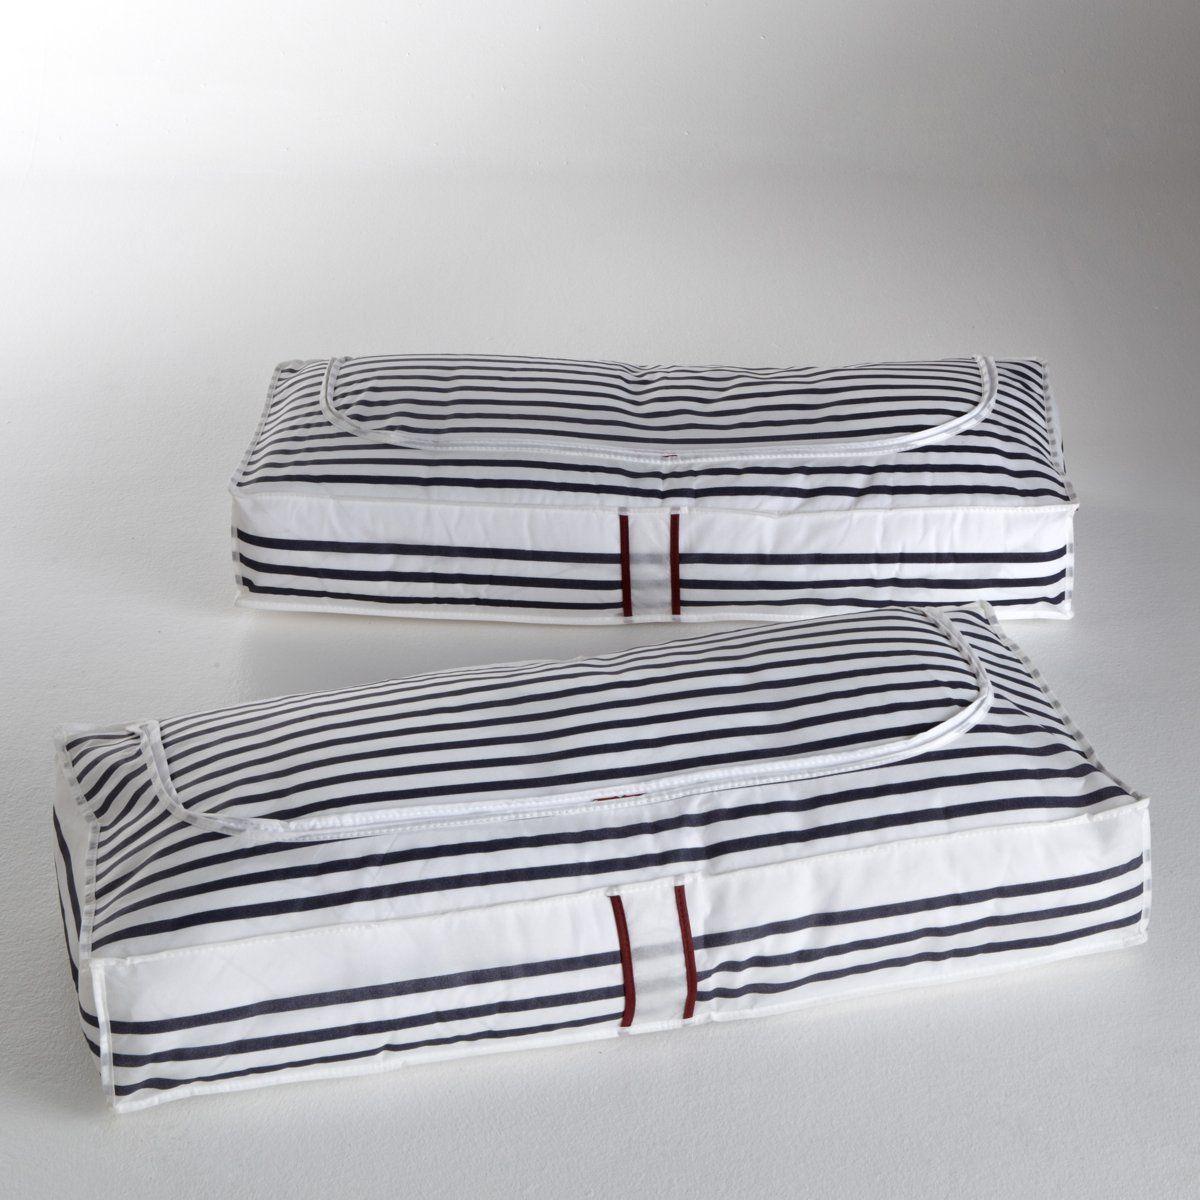 housse de rangement linge topiwall. Black Bedroom Furniture Sets. Home Design Ideas